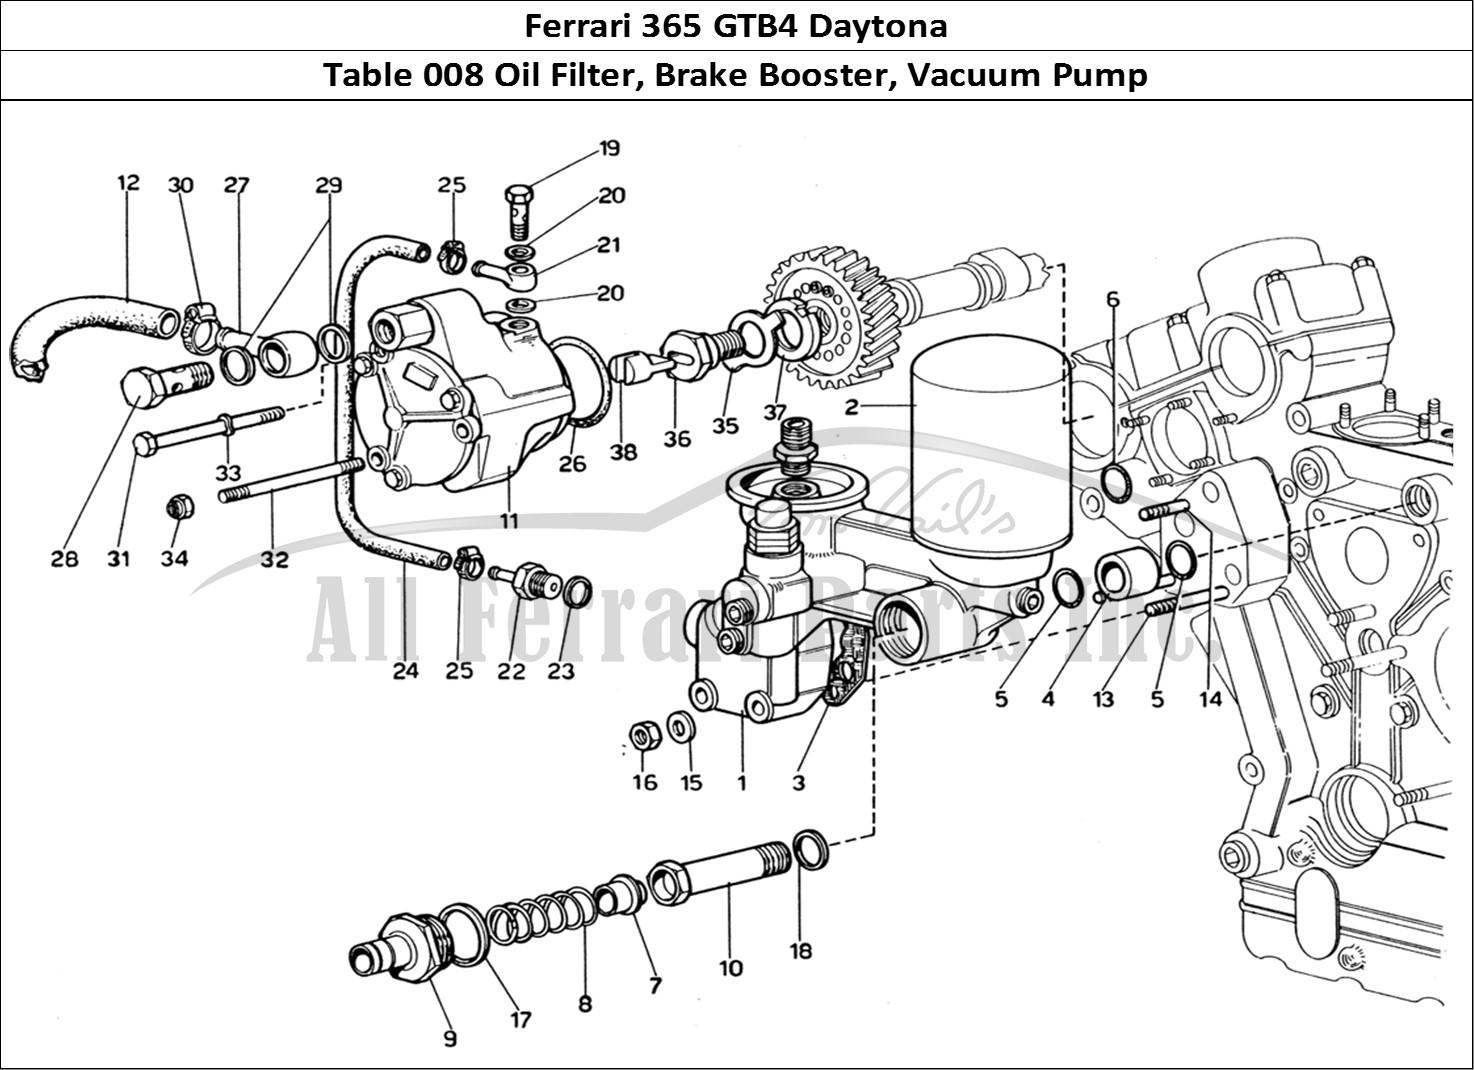 Buy Original Ferrari 365 Gtb4 Daytona 008 Oil Filter Brake Booster Vacuum Pump Ferrari Parts